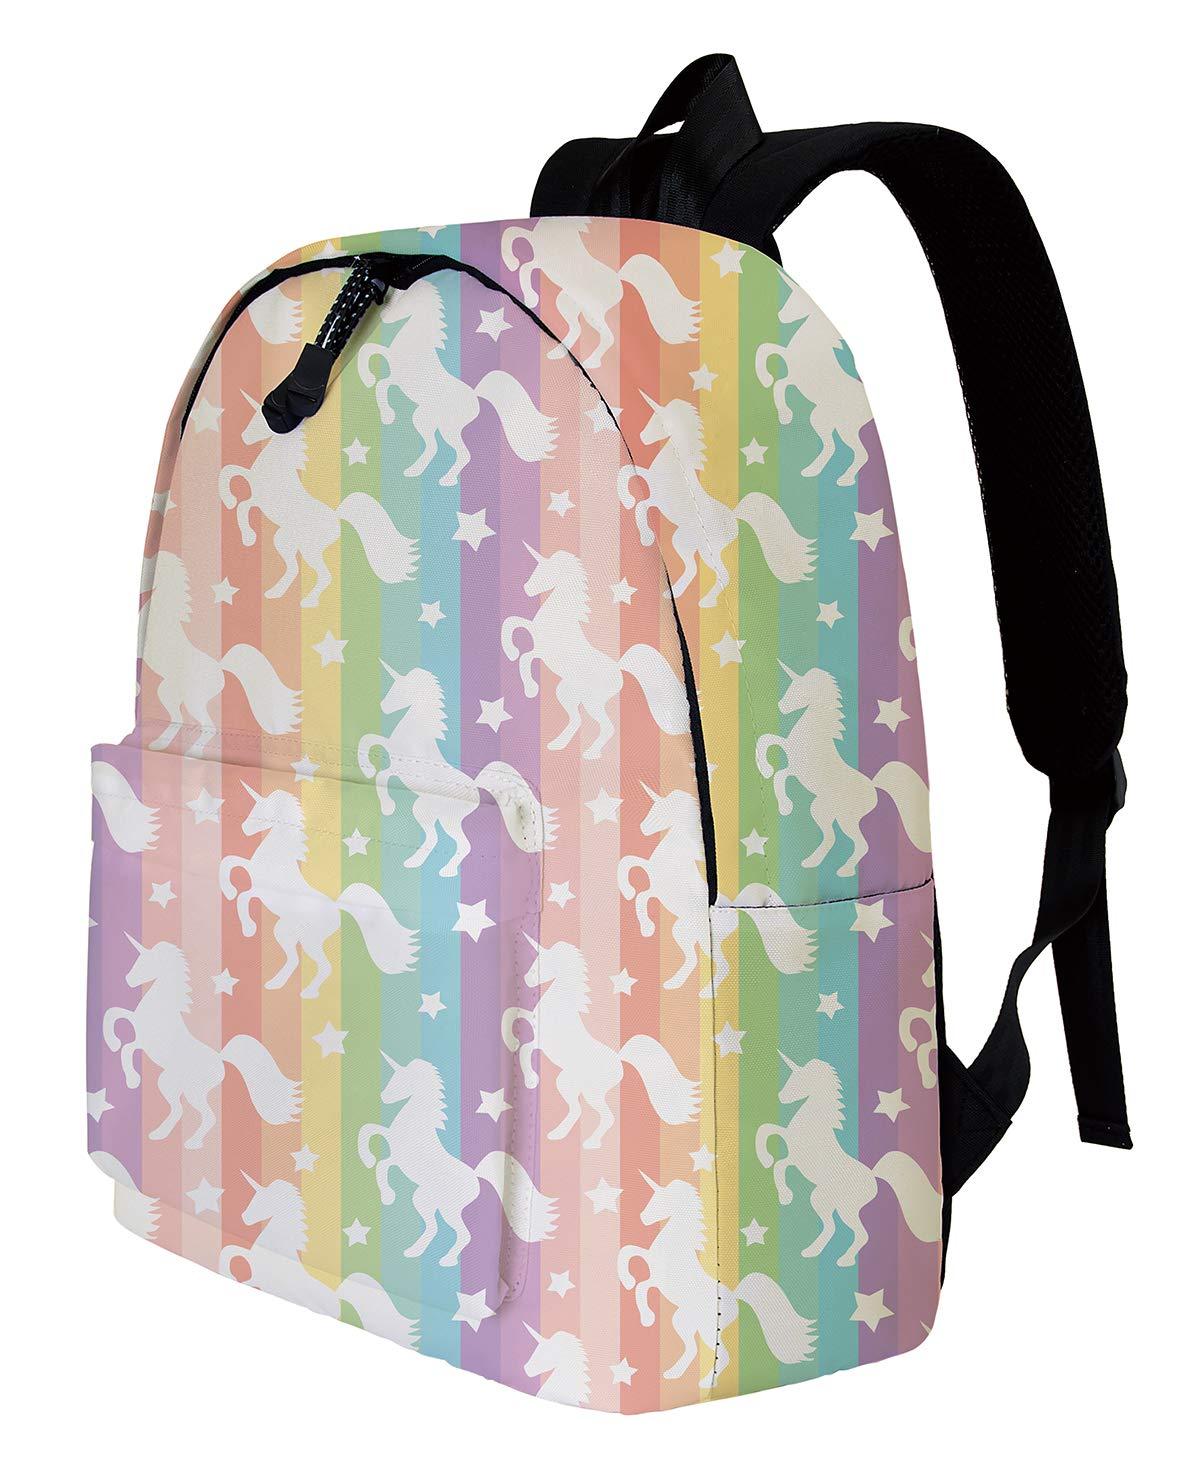 Trendy Funky Back Pack Heavy Duty Padded Knapsack Bag Vivid Colorful Rainbow Unicorn Female Kid Teens Teenage Little Girls Adorable Kid Themed Daypack For Primary Elementary School Kindergarten